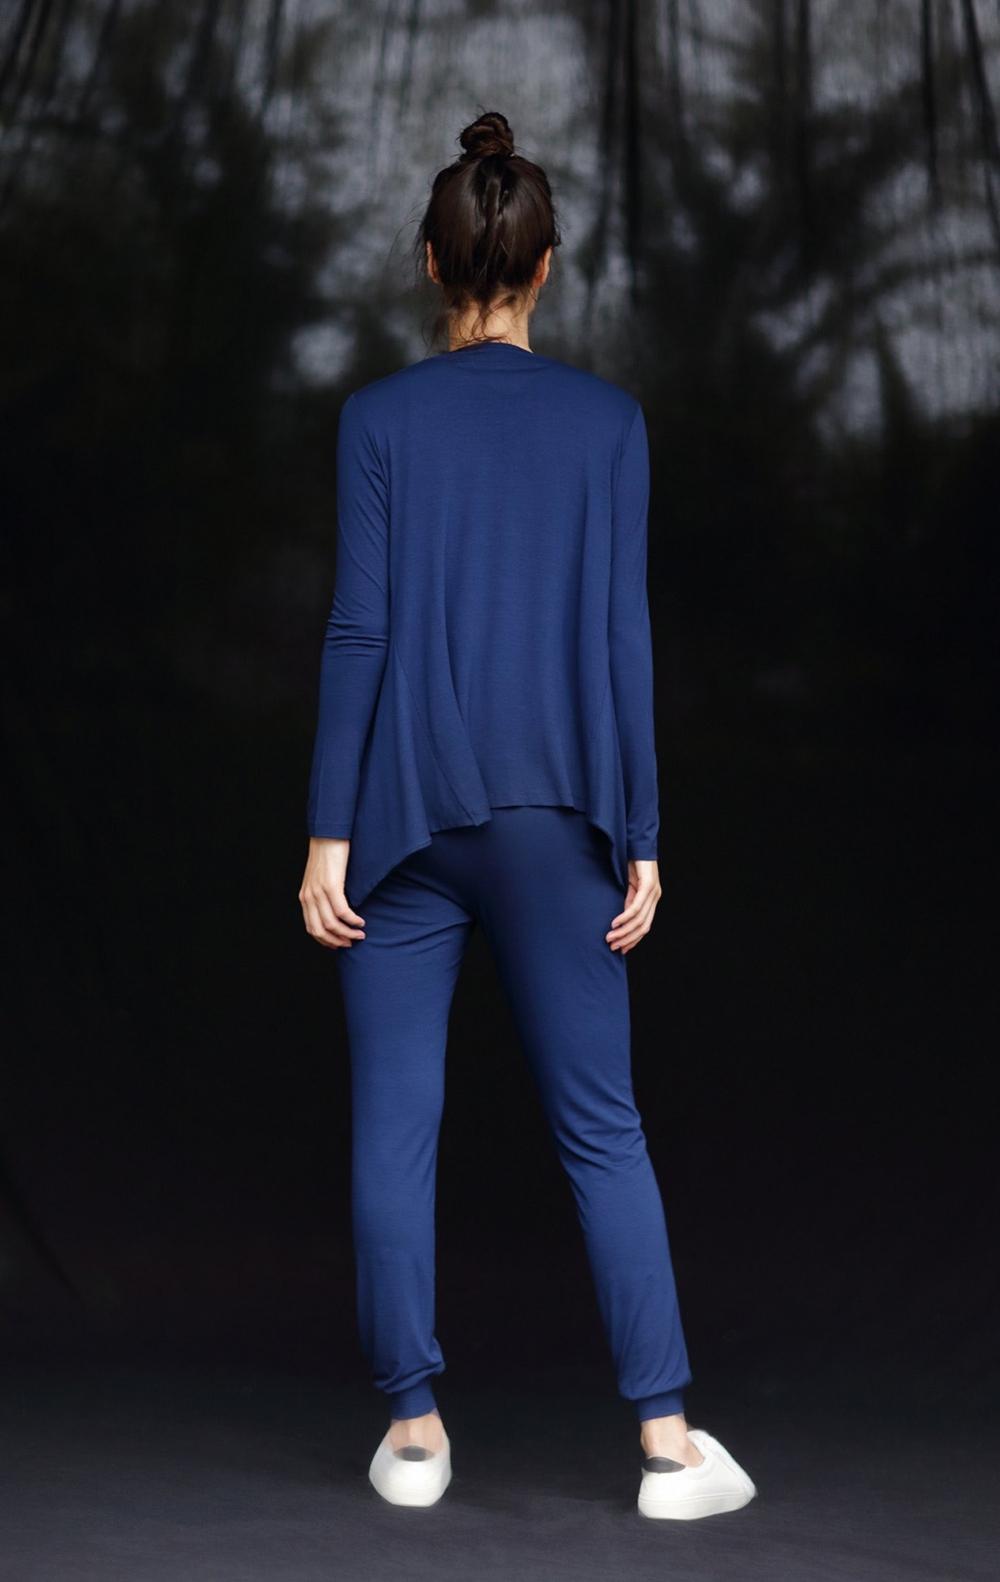 Conjunto Malha Twin Set + Calça Azul  - Foto 2